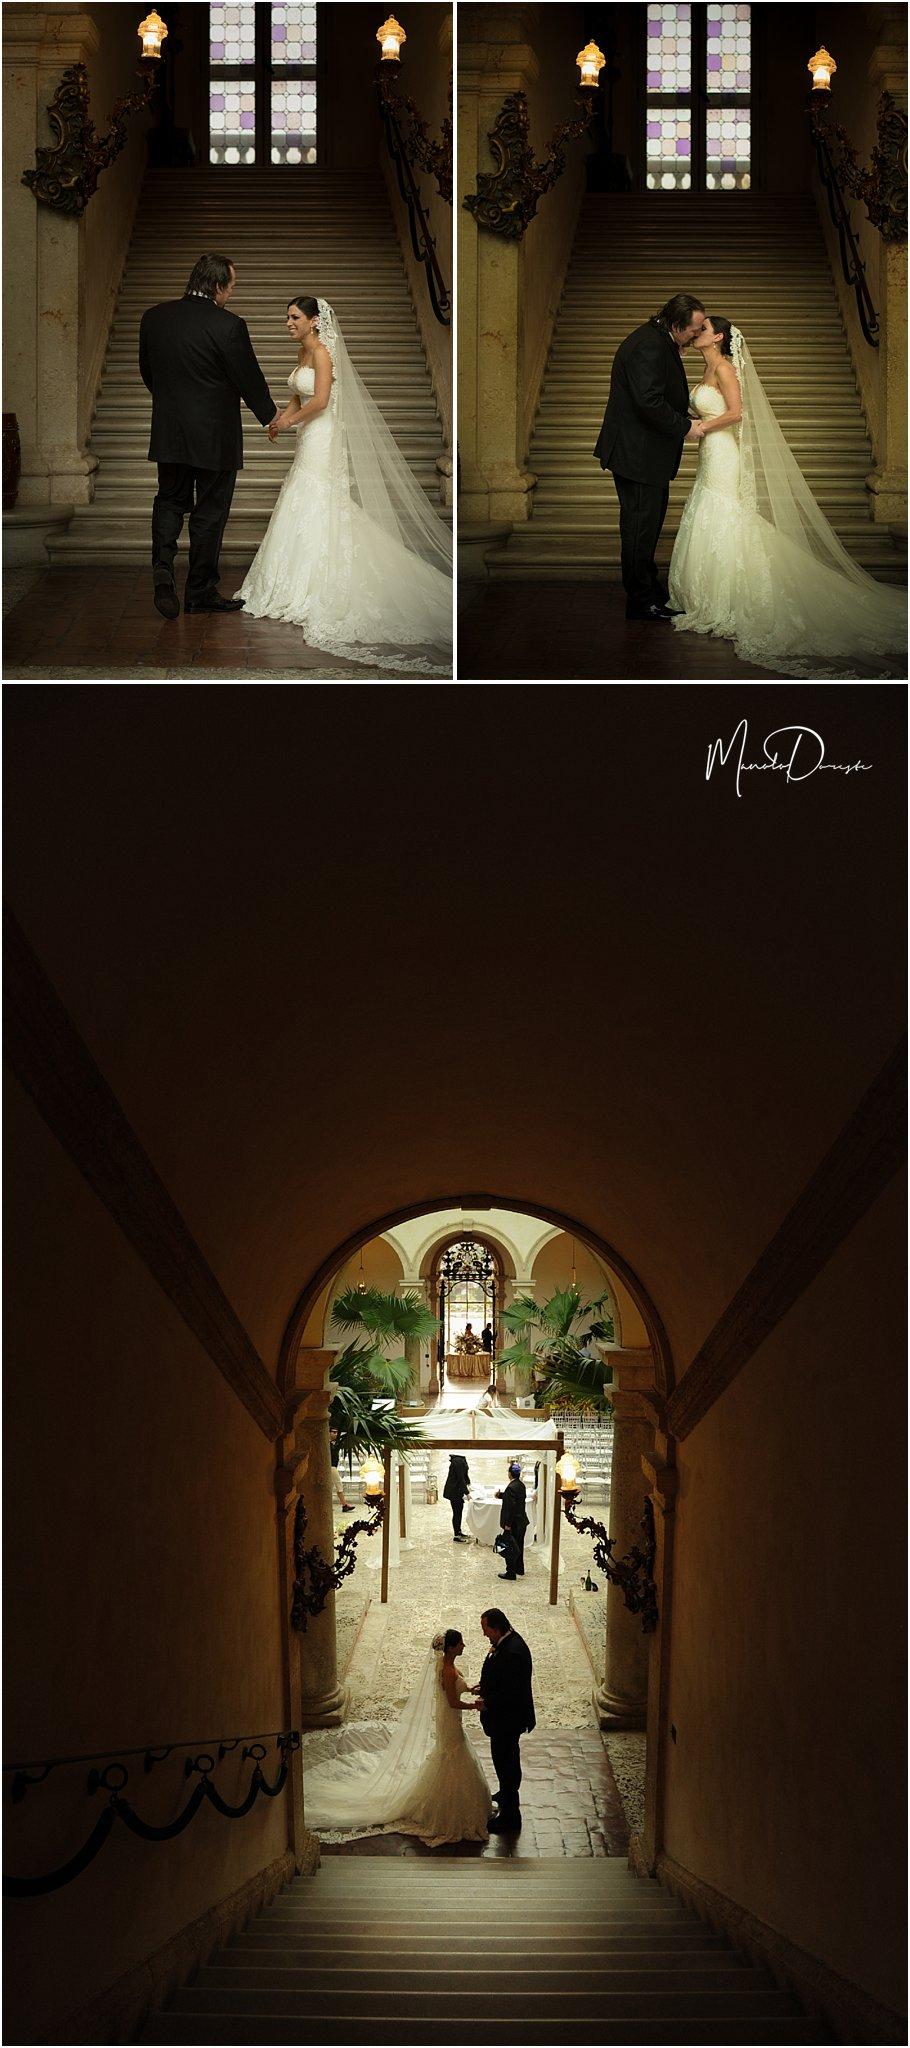 00755_ManoloDoreste_InFocusStudios_Wedding_Family_Photography_Miami_MiamiPhotographer.jpg